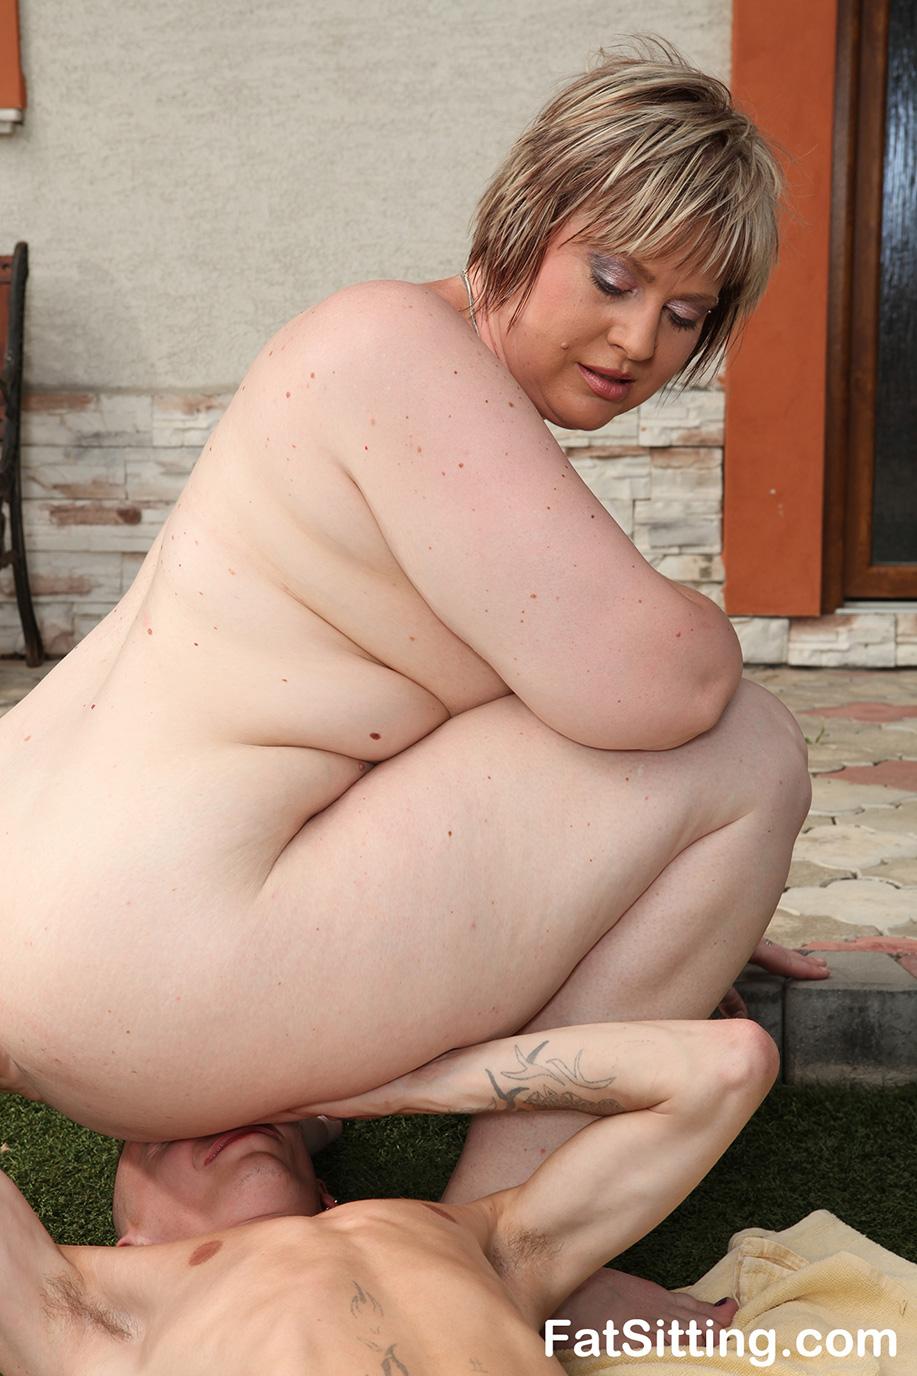 Amazing bbw mistress diana facesitting